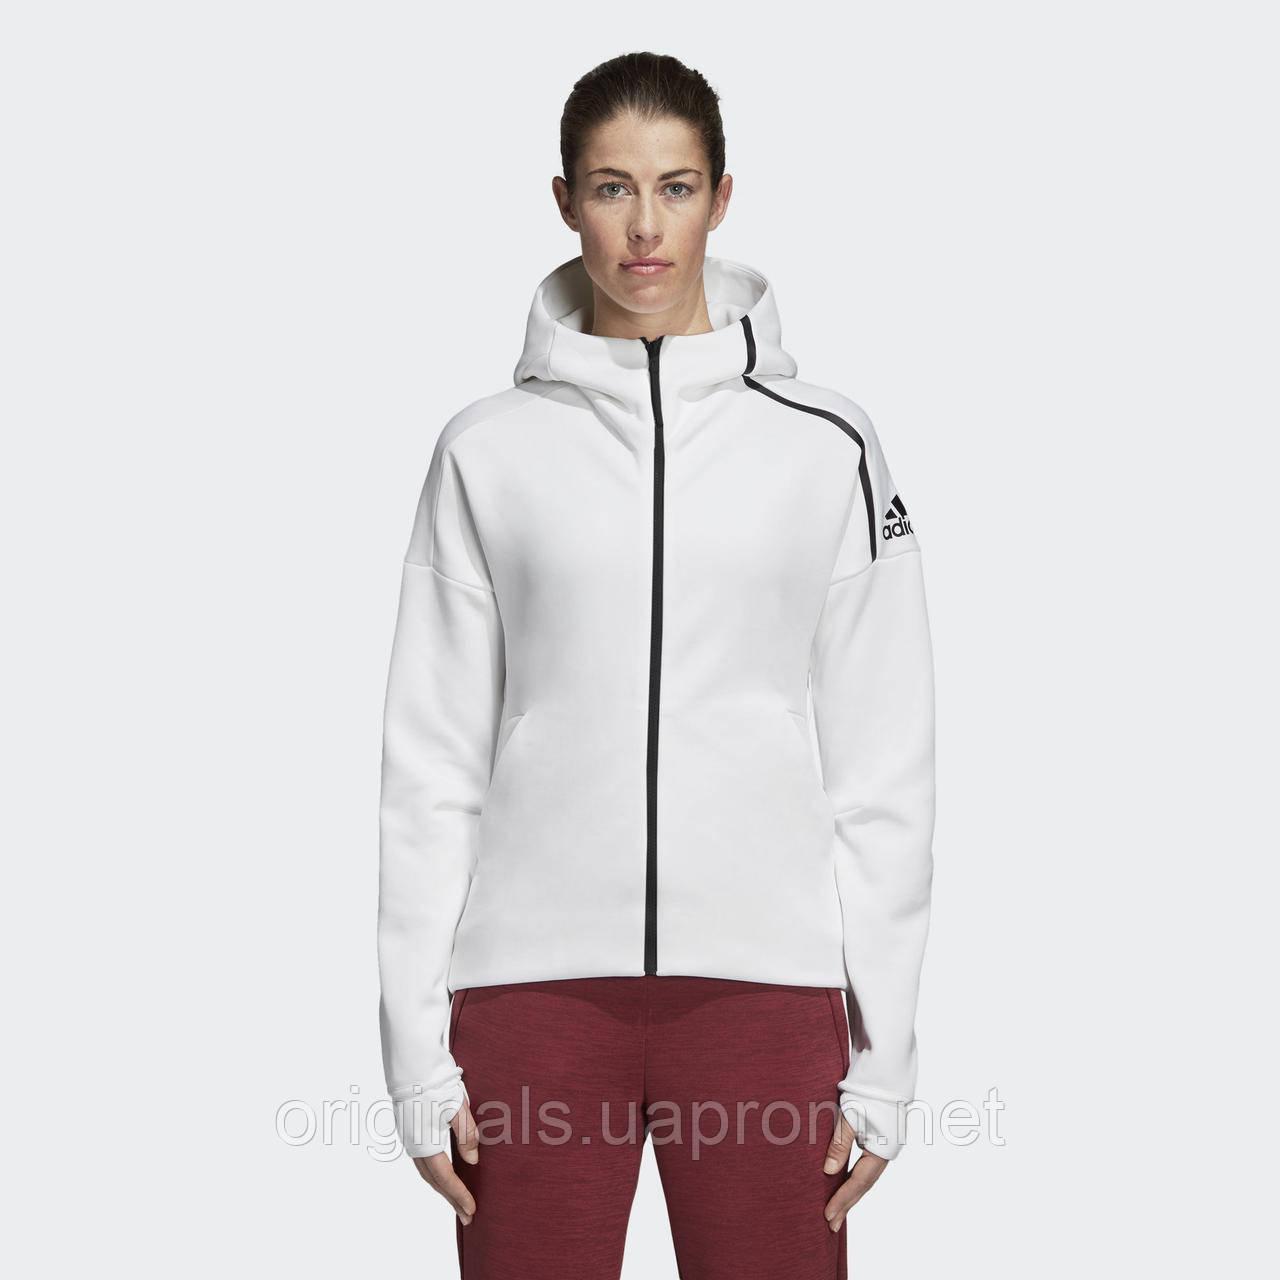 Женская толстовка Adidas Z.N.E. Fast Release W DN8508